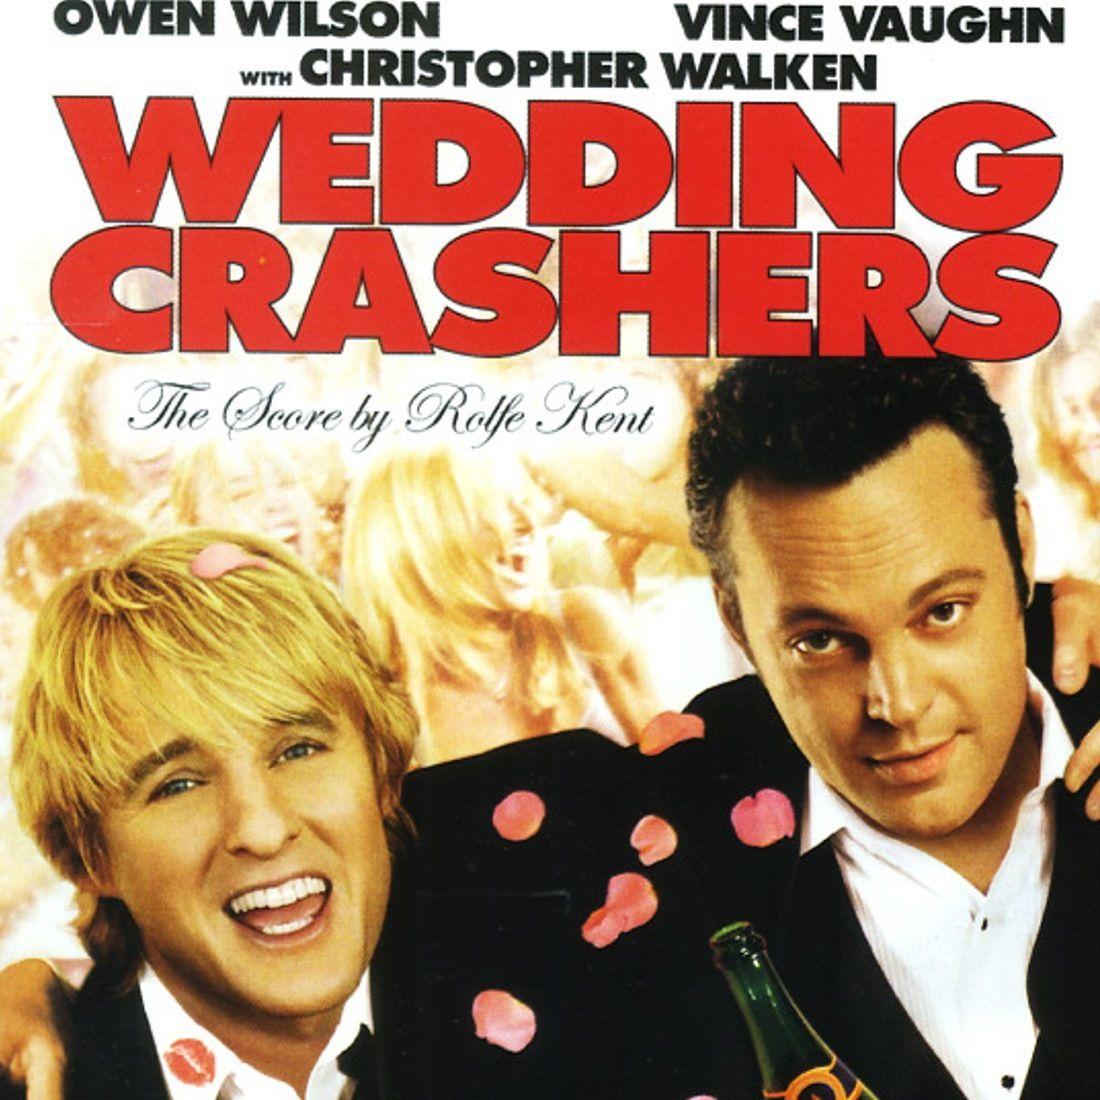 Wedding Crashers Movie Score Soundtrack 2005 Wedding Movies Funny Movies Comedy Movies